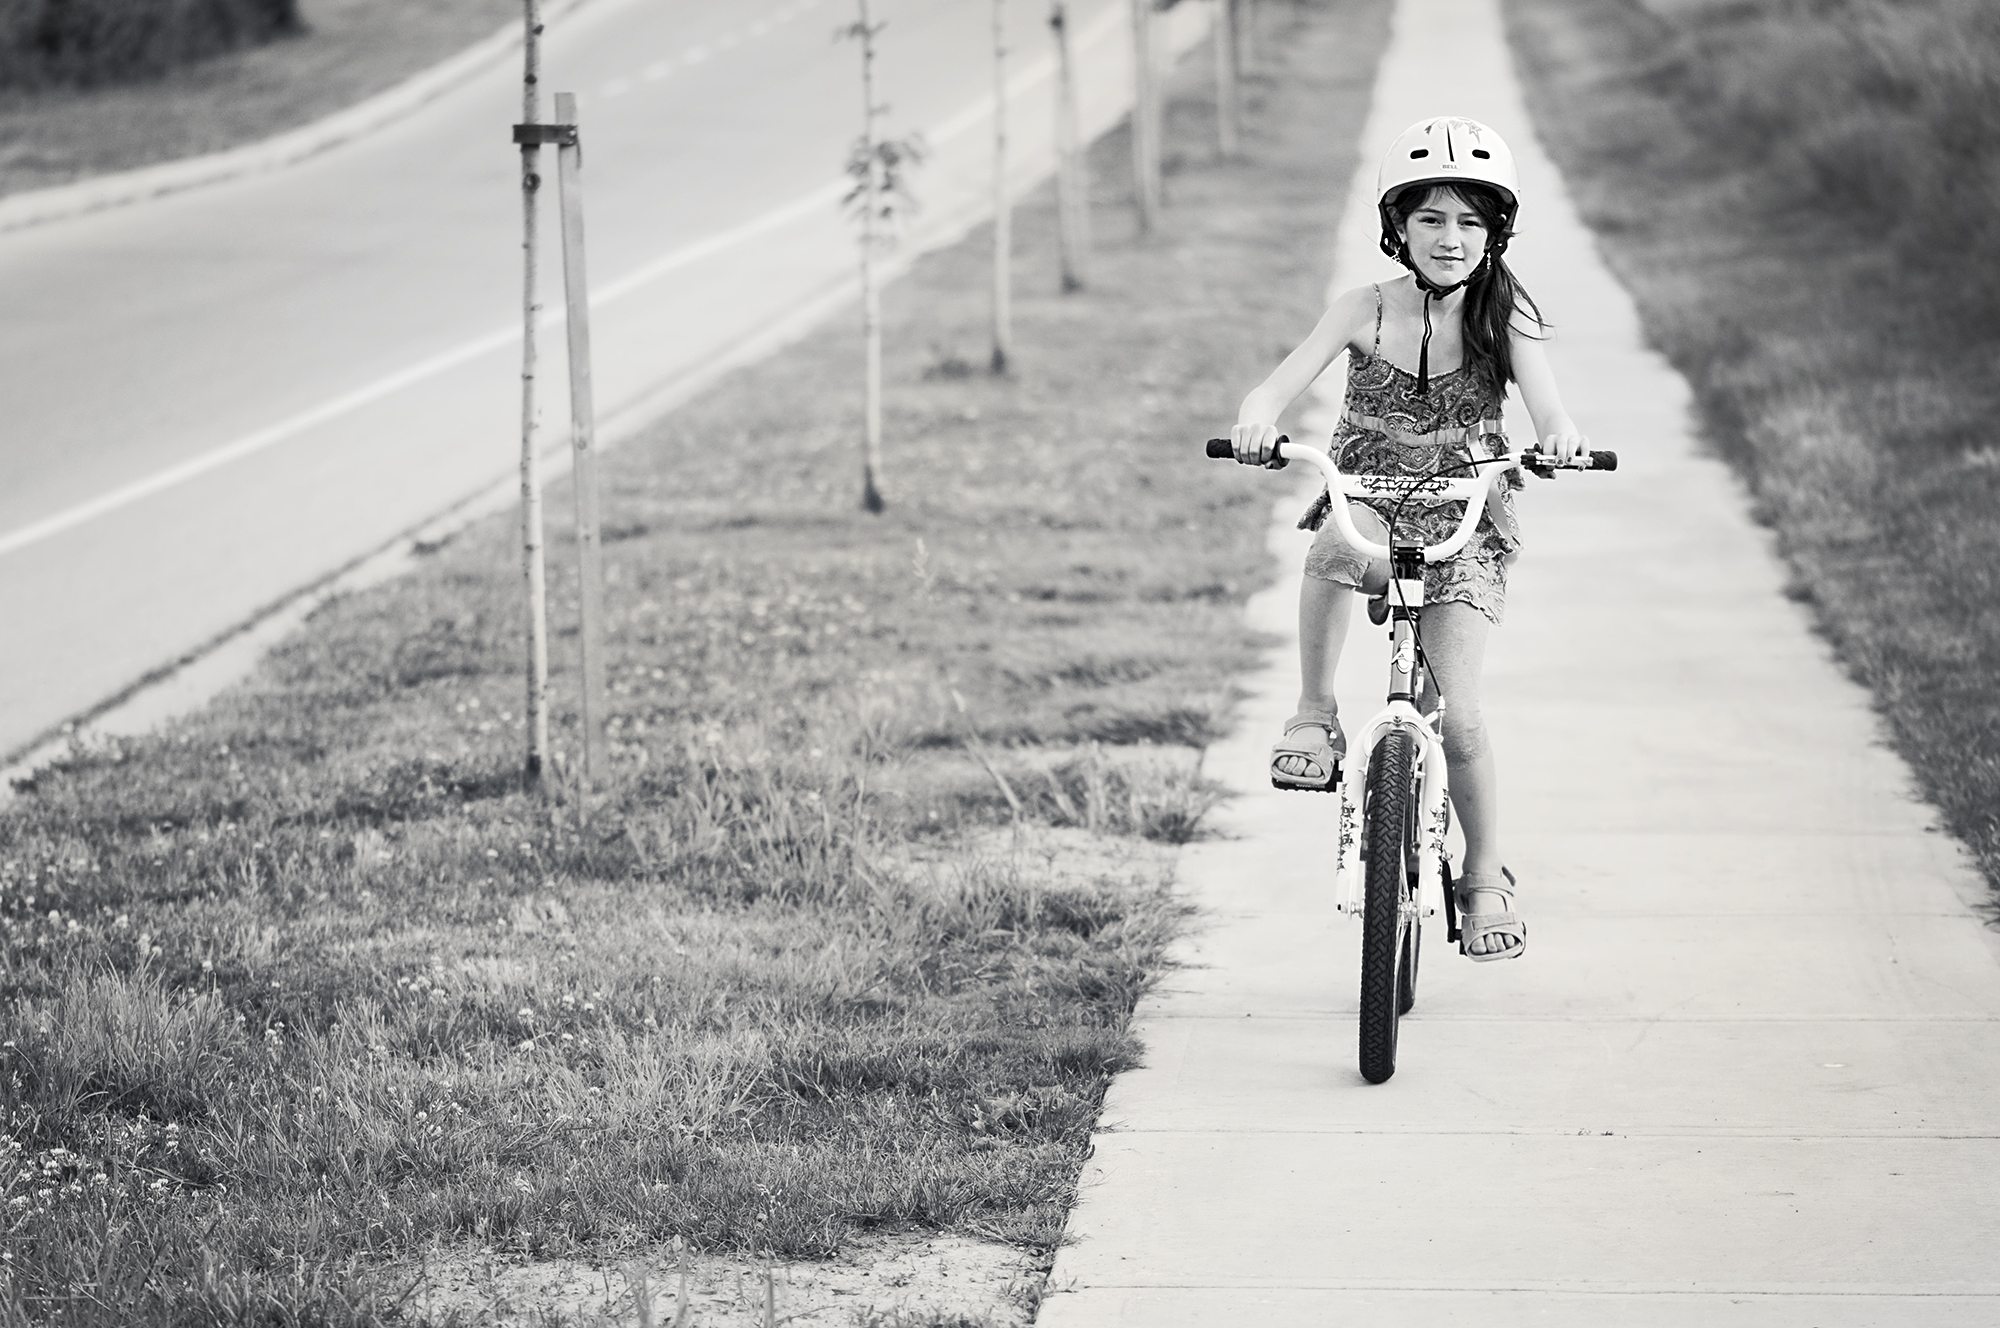 2012-06-08 - Bike Ride O